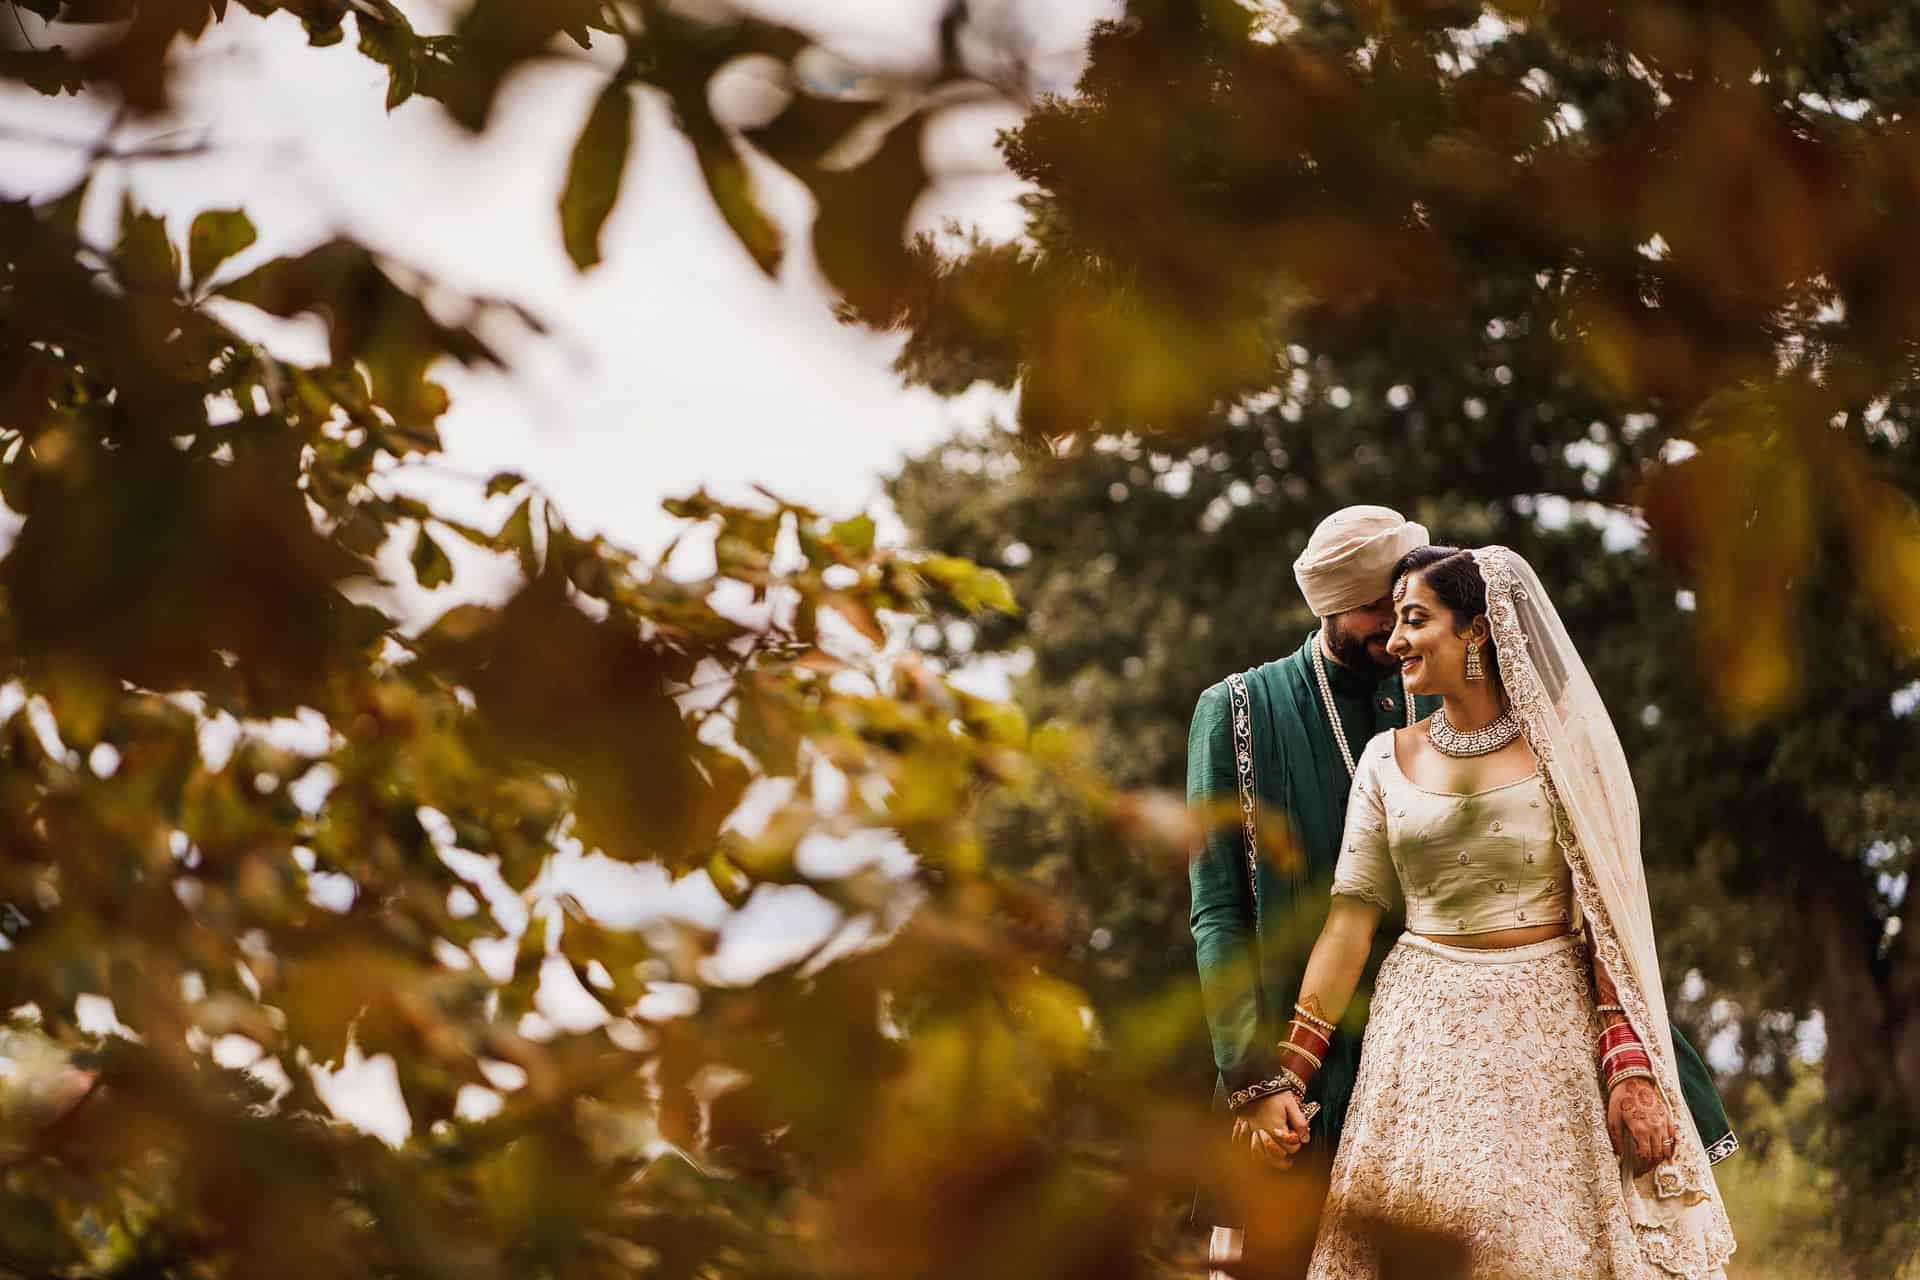 best london wedding photographer 2020